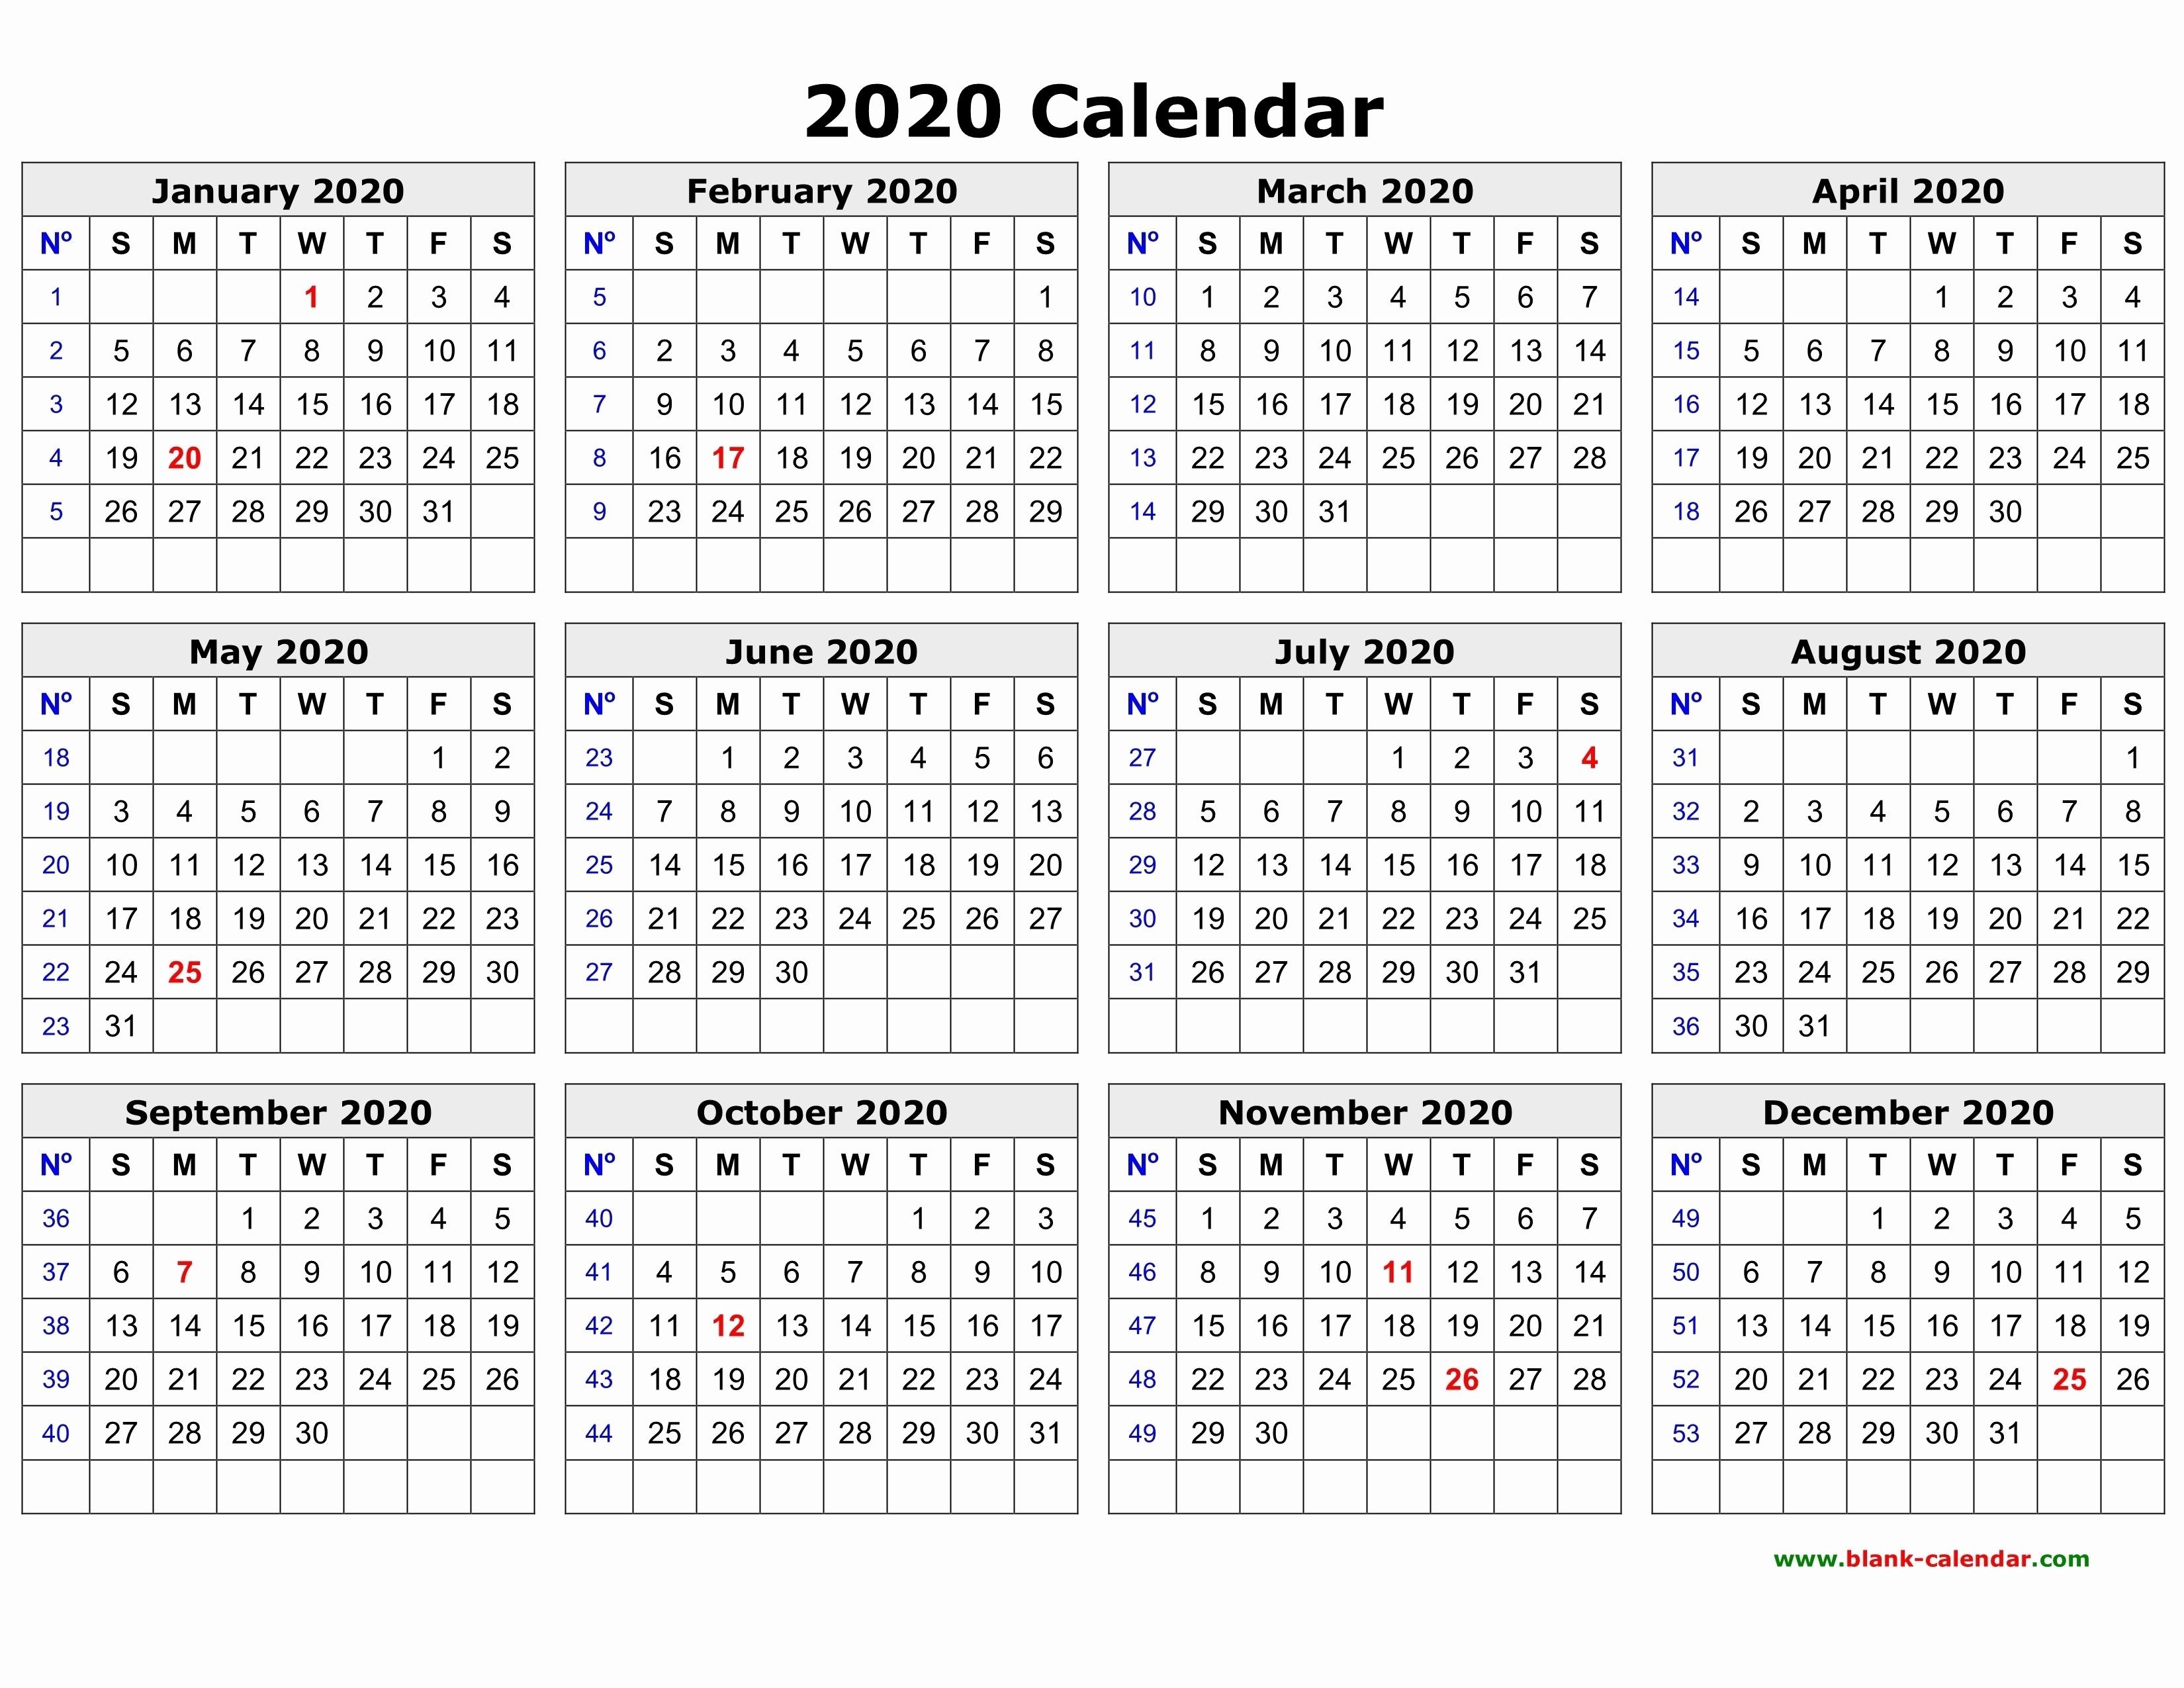 Calendar For School Year 2020-19 | Calendar Design Ideas_Blank Calendar School Year 2020-19